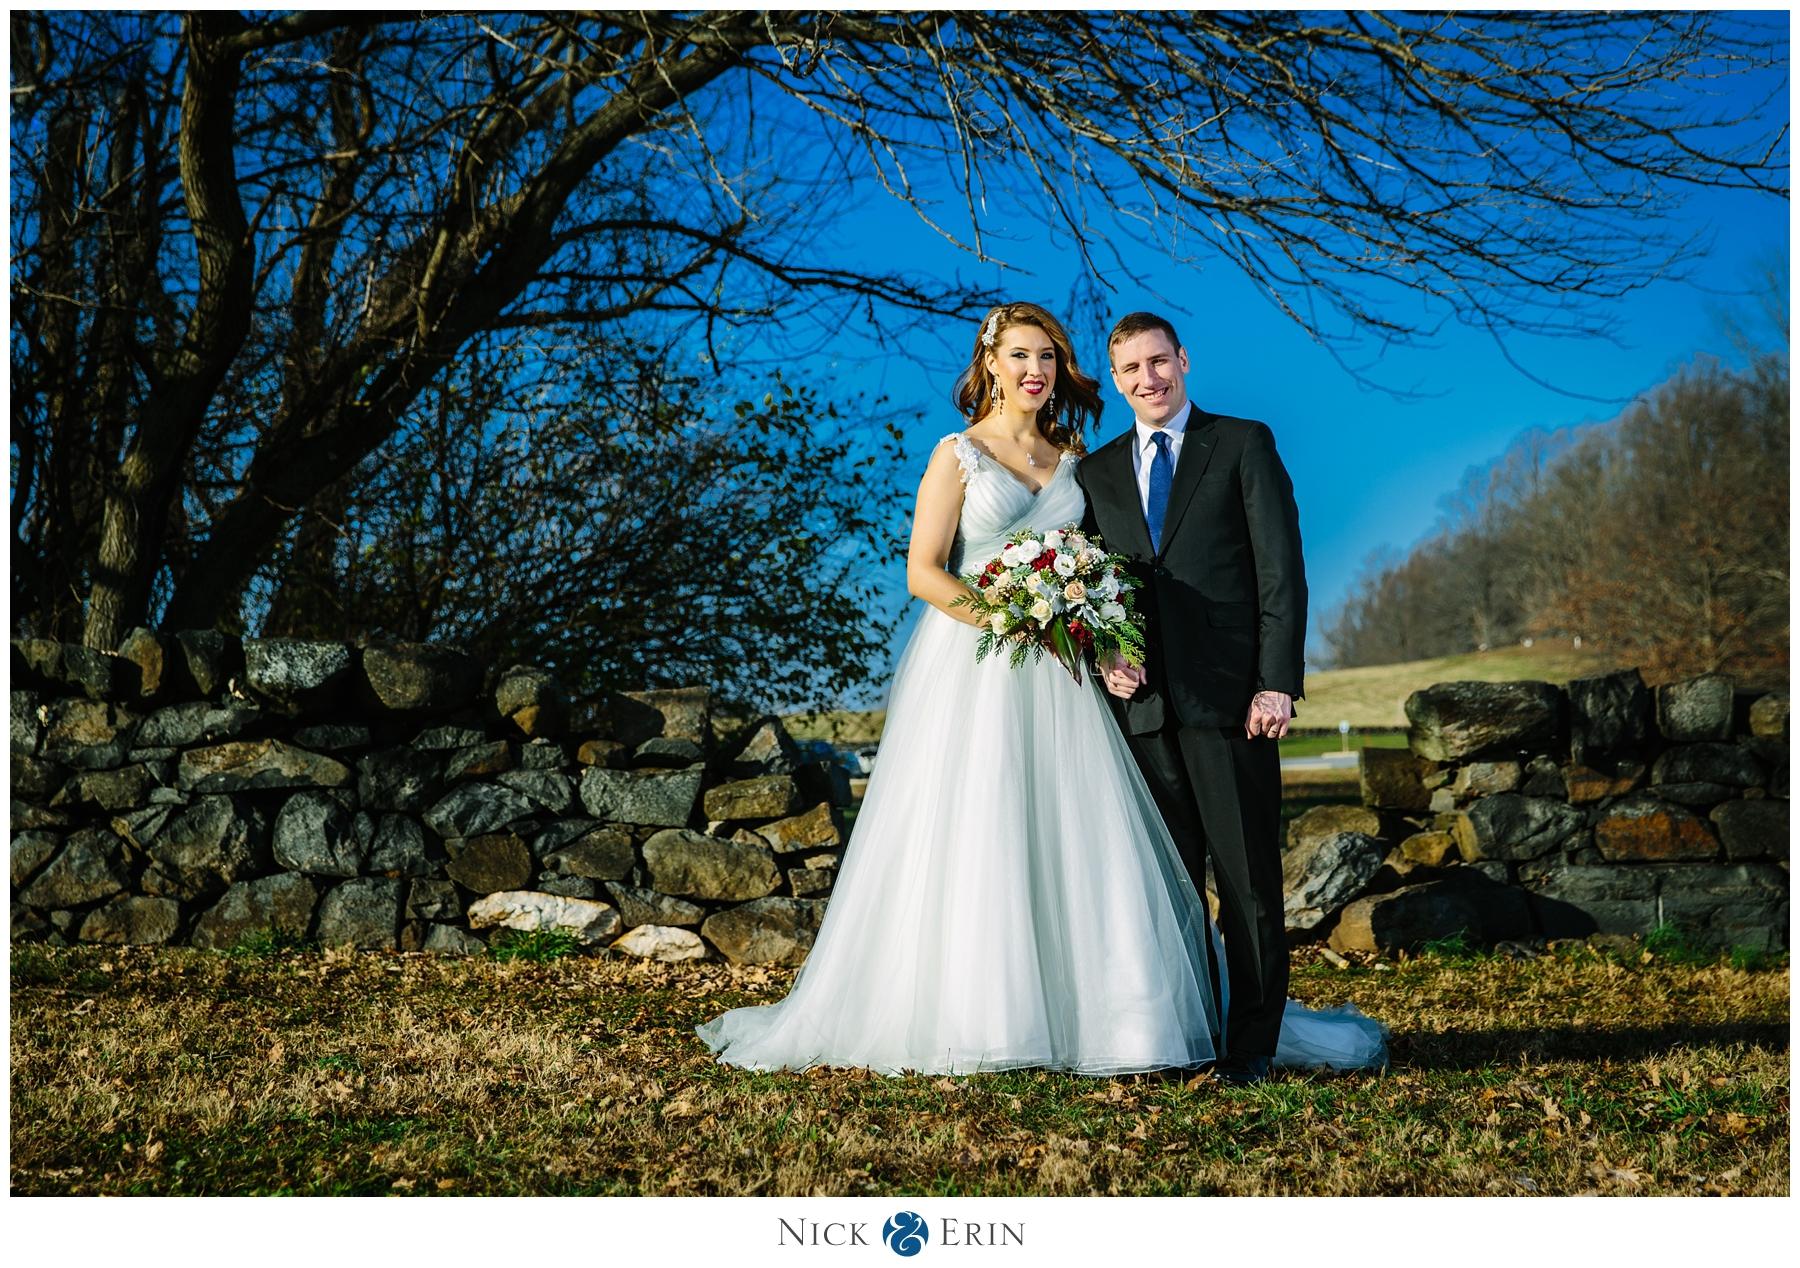 Donner_Photography_Mendenhall Inn Wedding_Blake & Kristina_0024